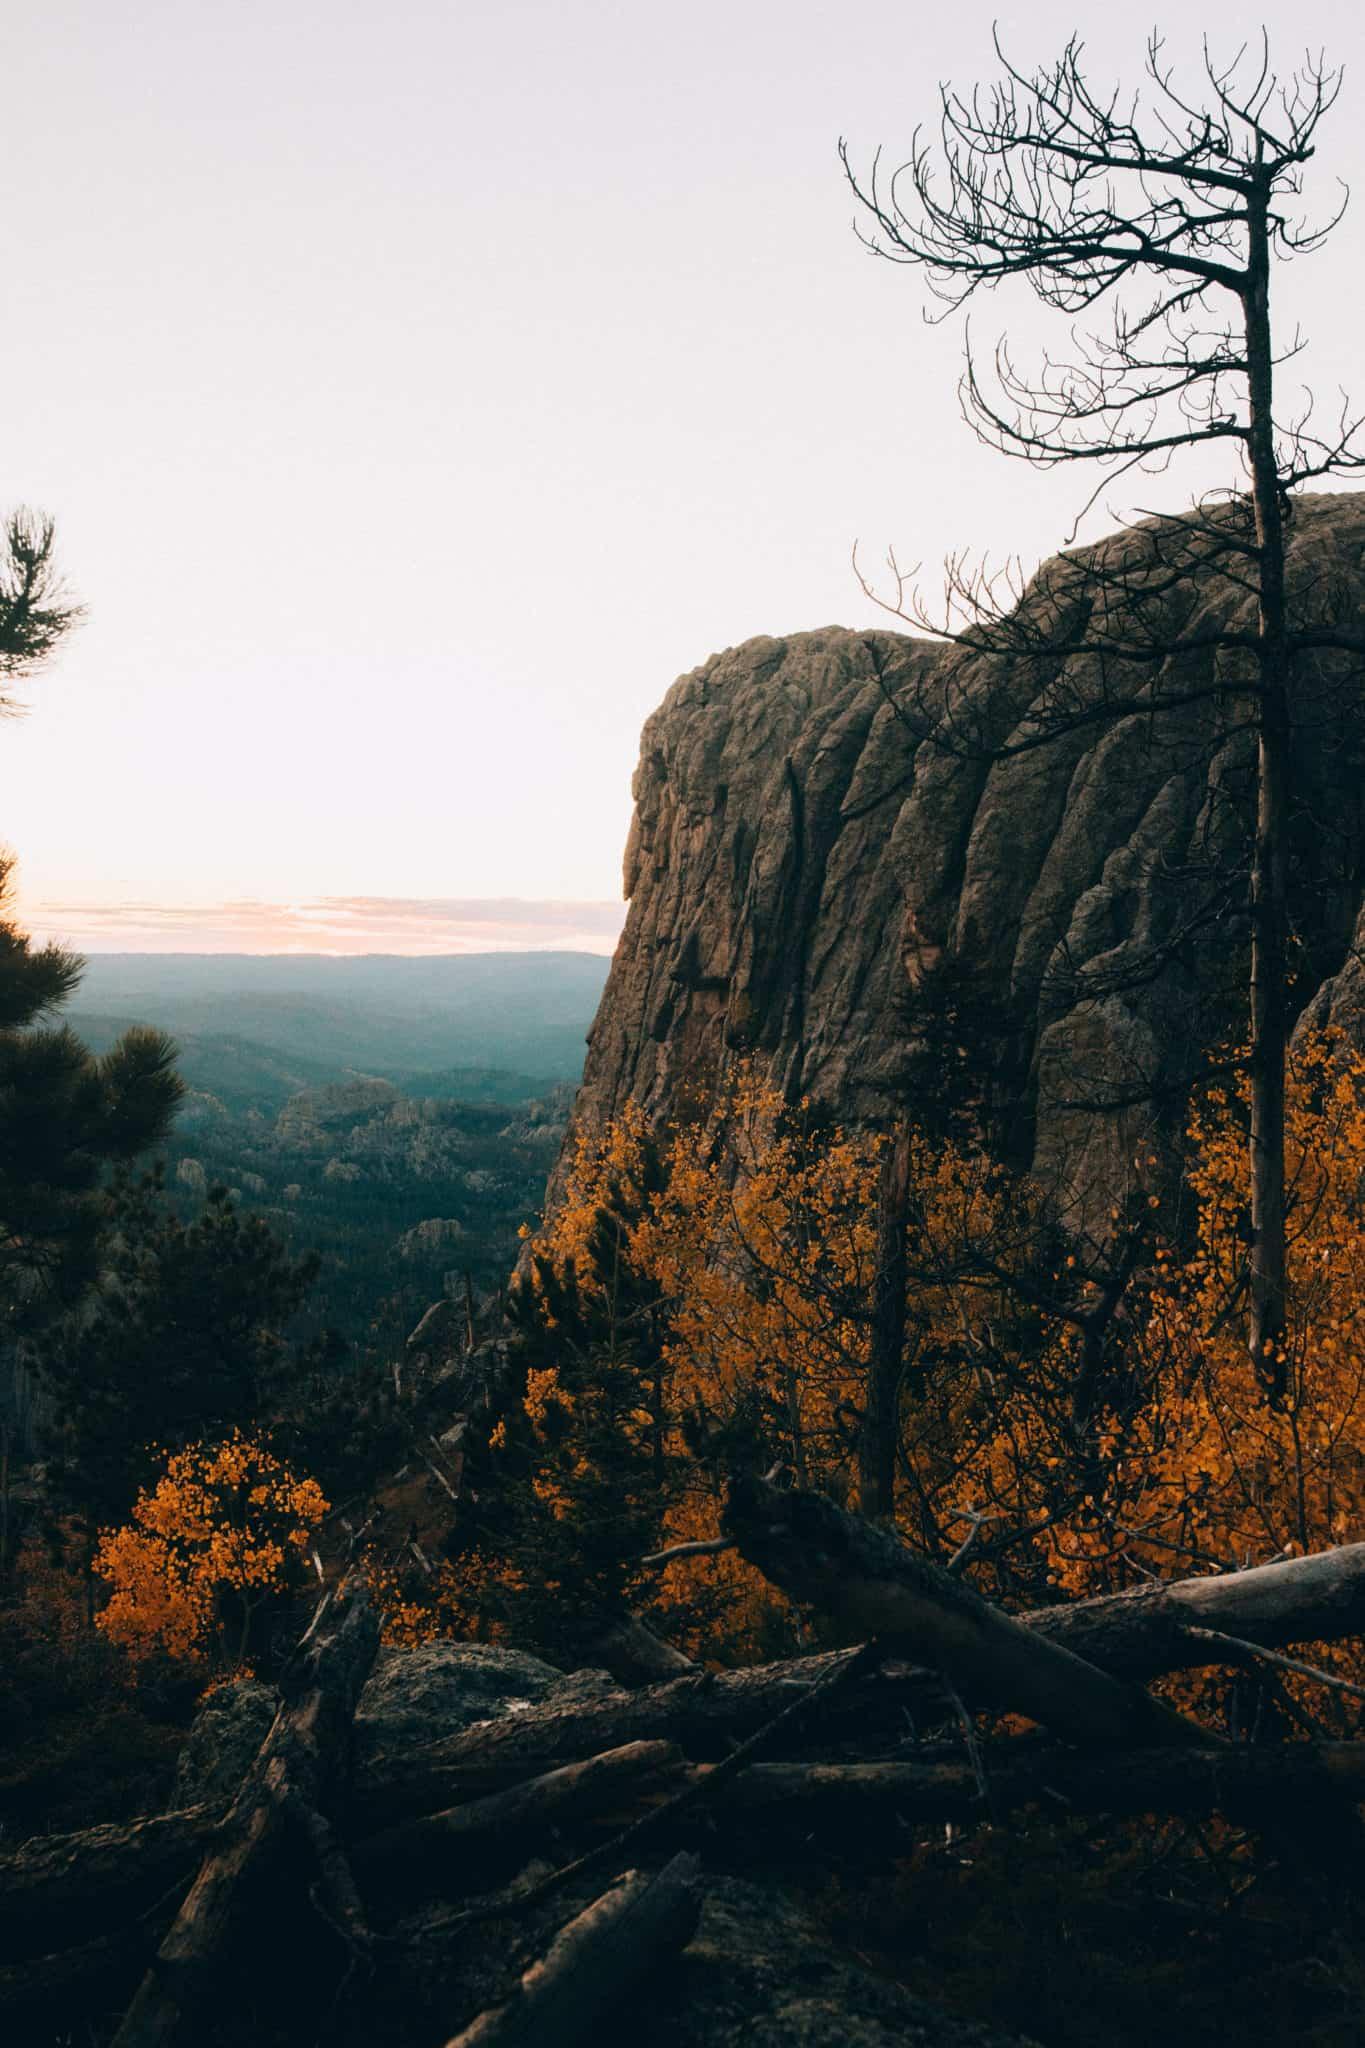 Cliff Dropoff in Black Elk Peak Wilderness, South Dakota